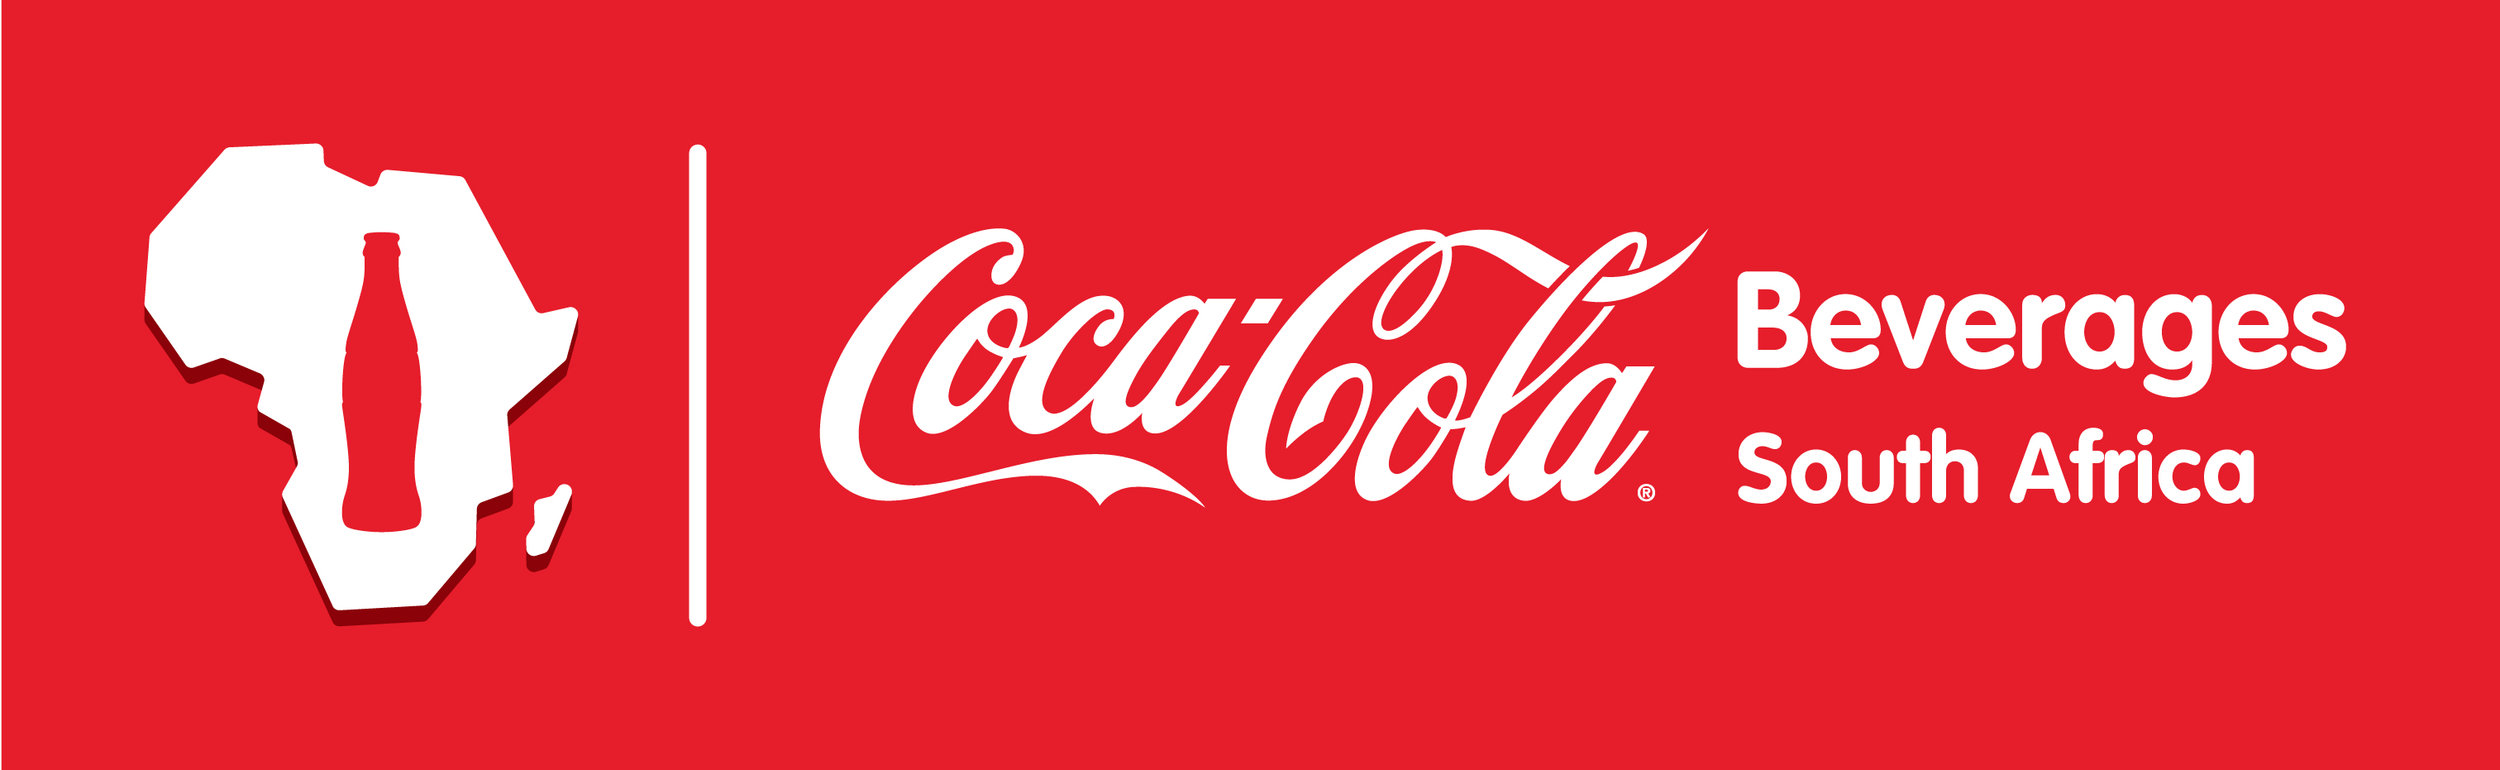 CCBSA_logo_RB.JPG